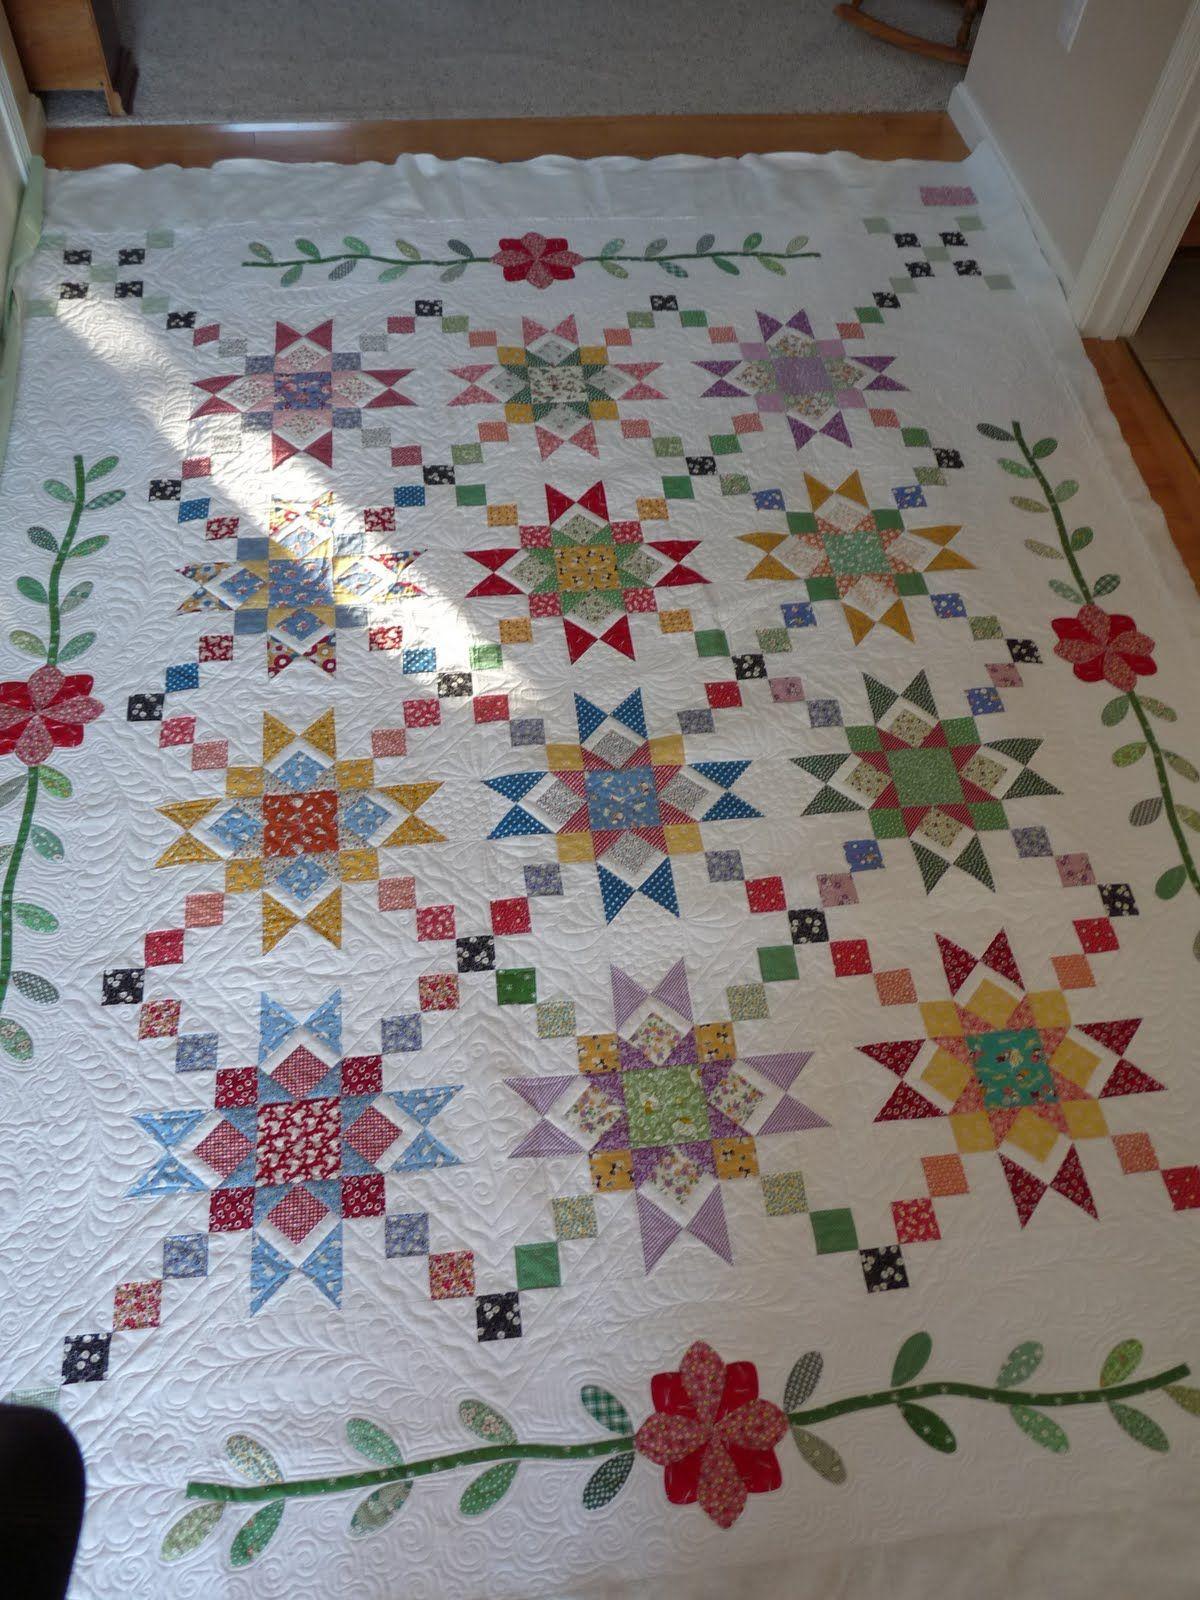 1930's quilt patterns - Google Search   Quilts - Pieced ... : 1930s quilt patterns - Adamdwight.com